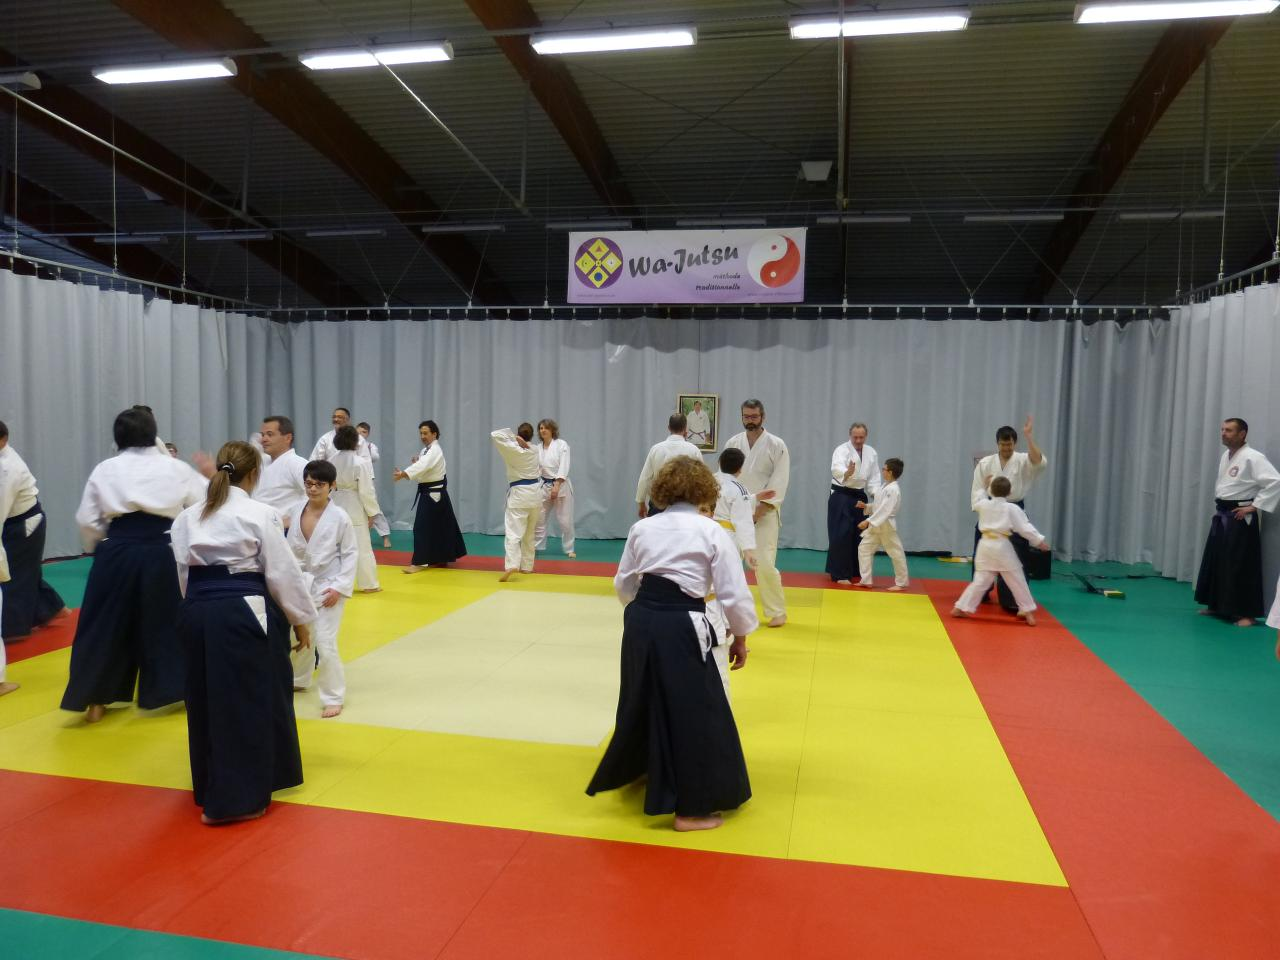 Kagami -Biraki WJV, mode d'entraînement, 13 janvier 2018